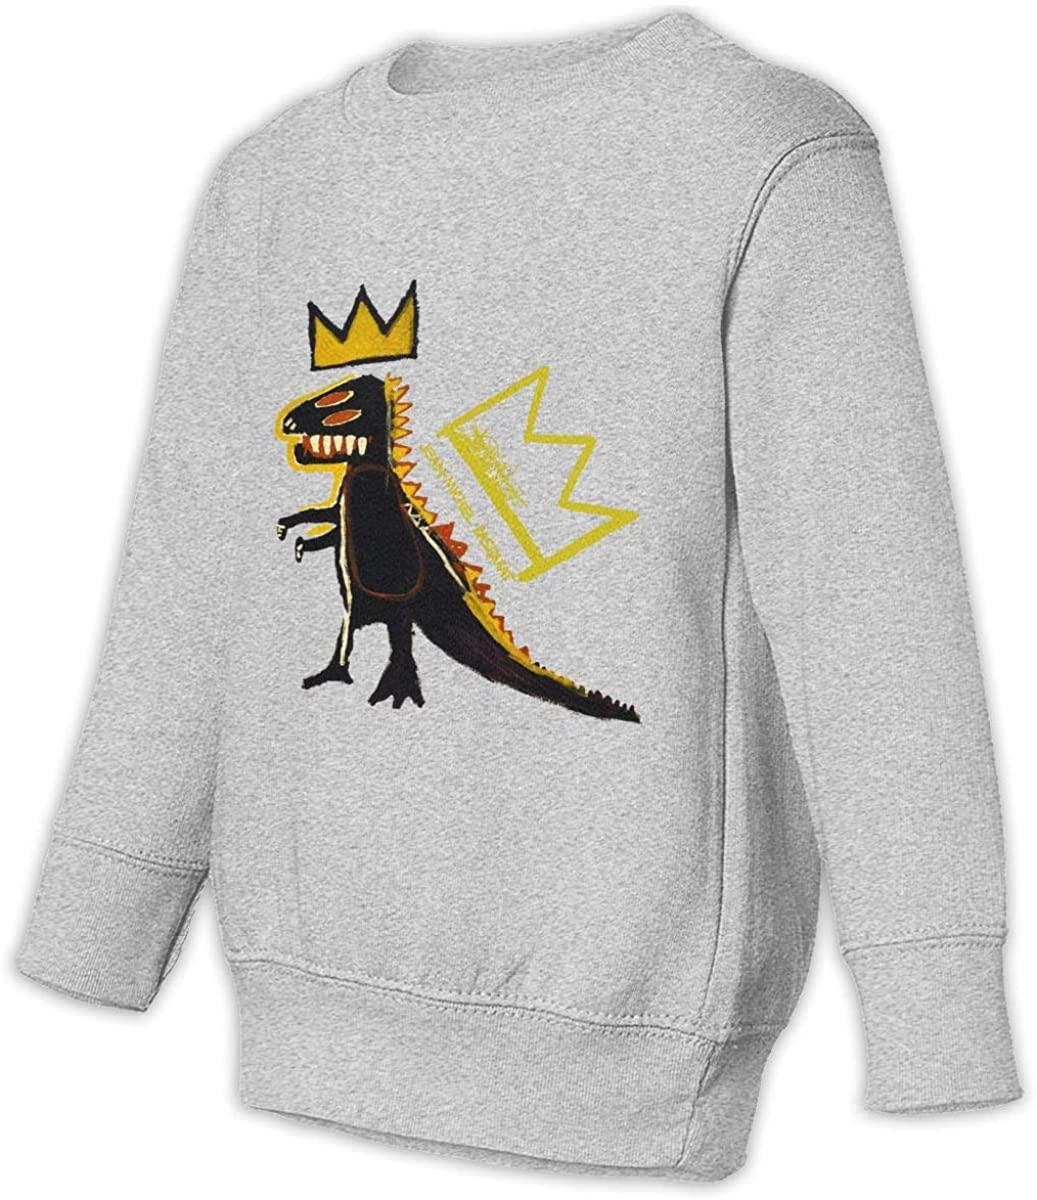 BodiGulick Jean-Michel Basquiat Boys and Girls Sweatshirts, Cotton Sports Tops Sweatshirt Black